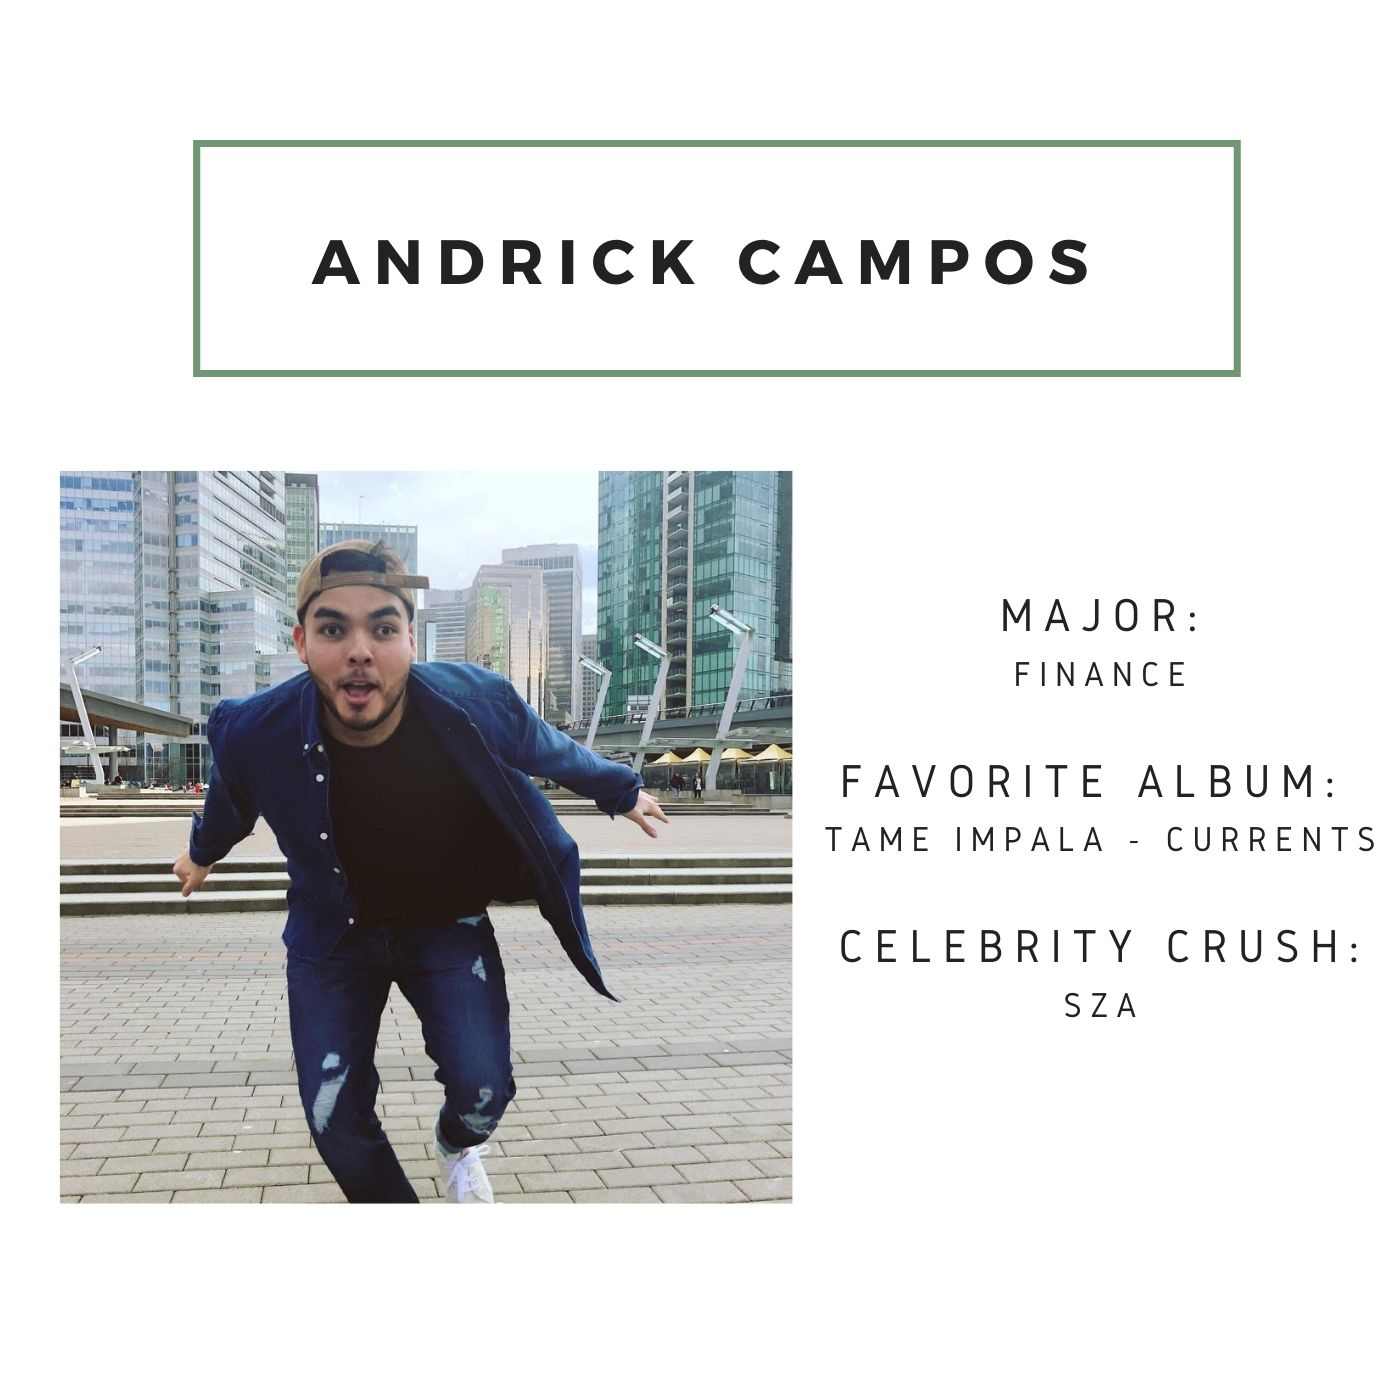 Andrick Campos